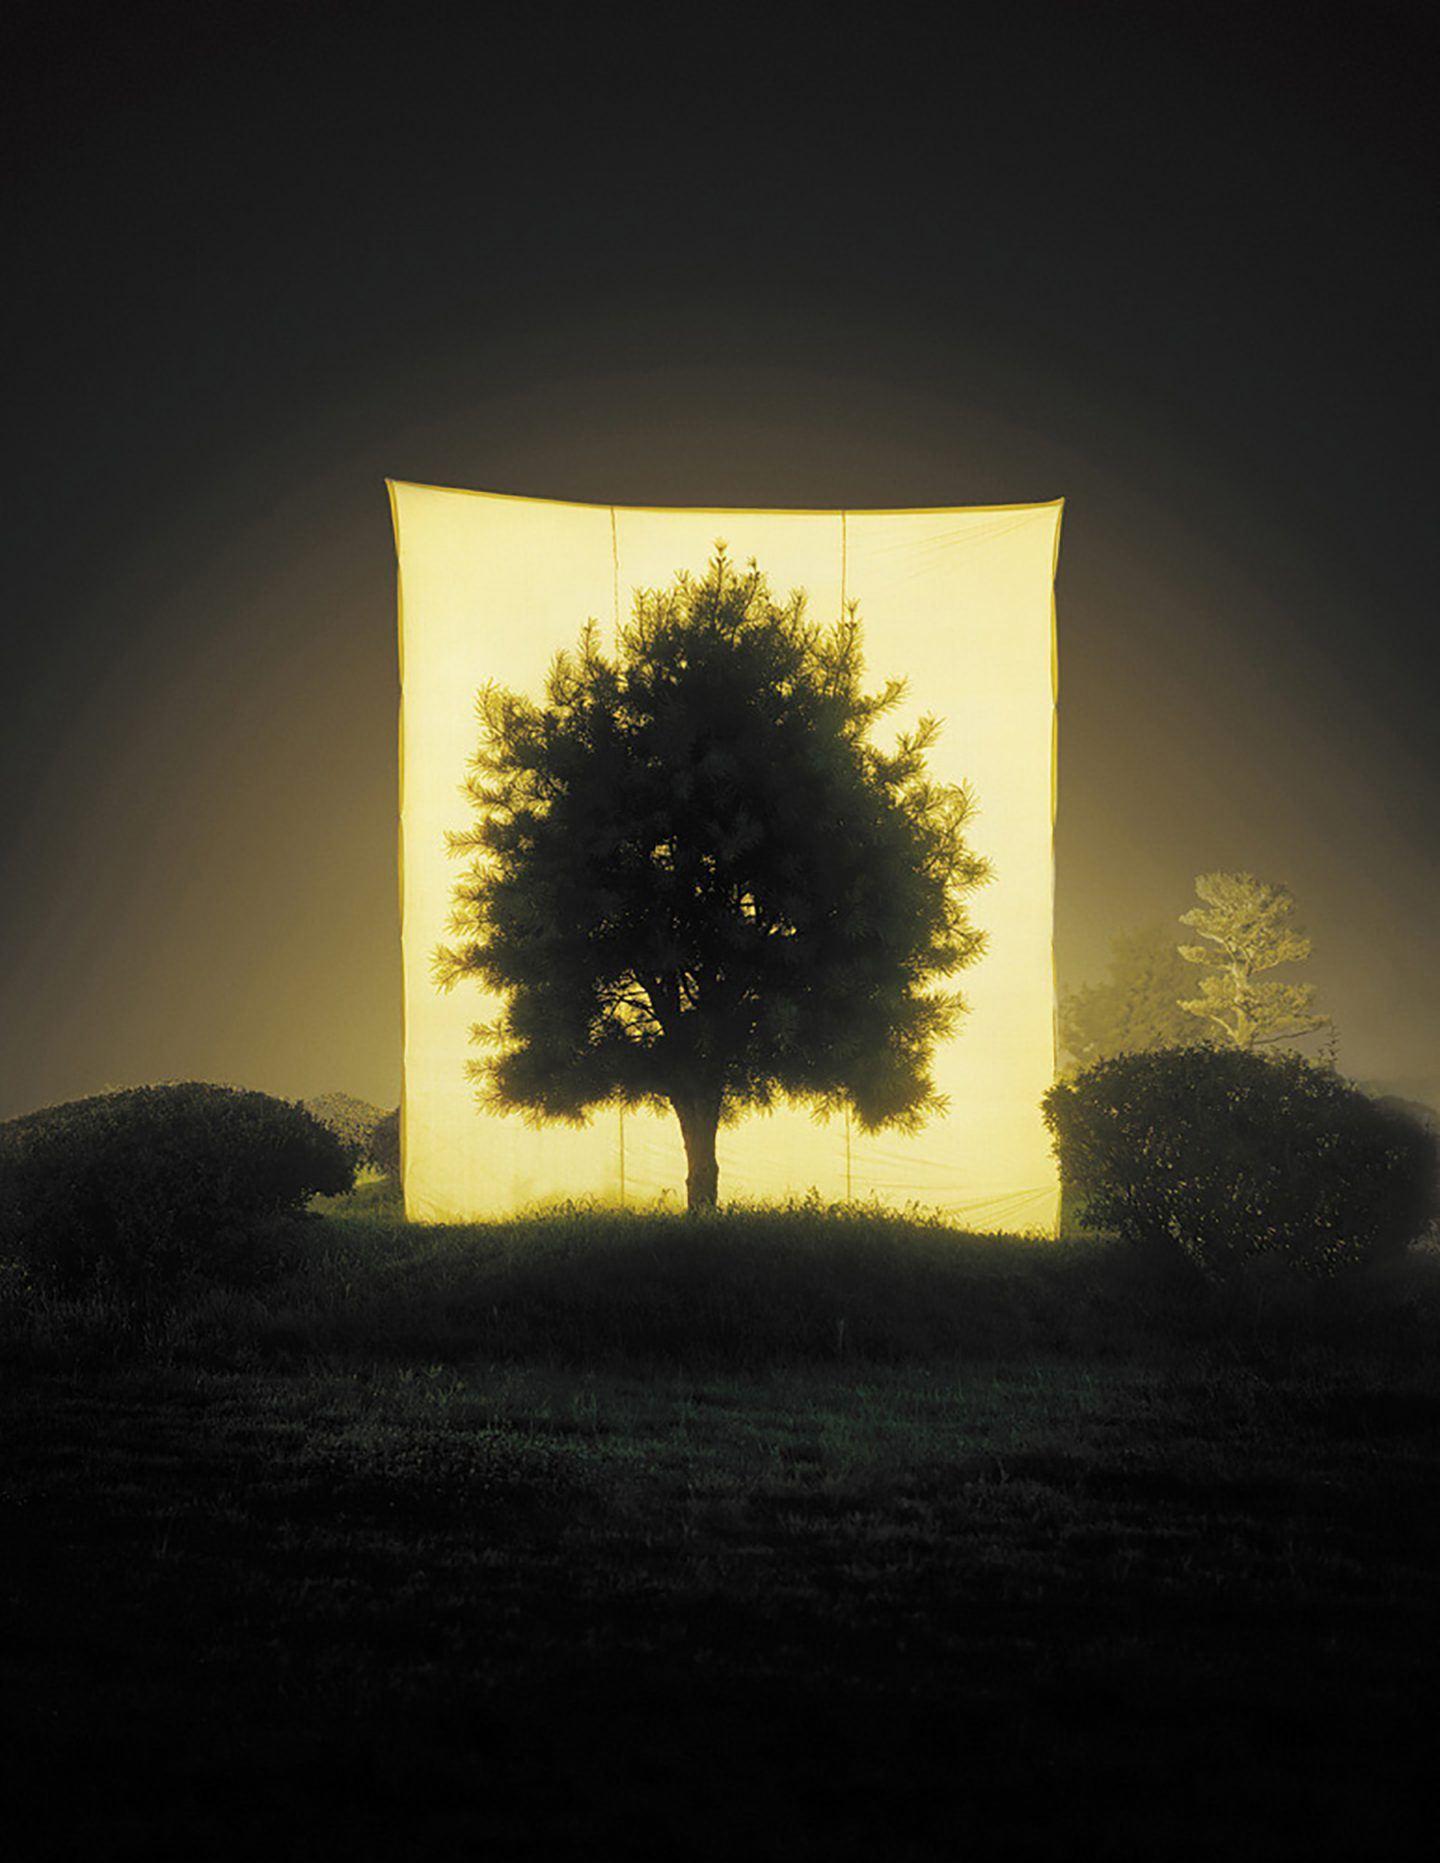 IGNANT-Art-Myoung-Ho-Lee-Tree-14